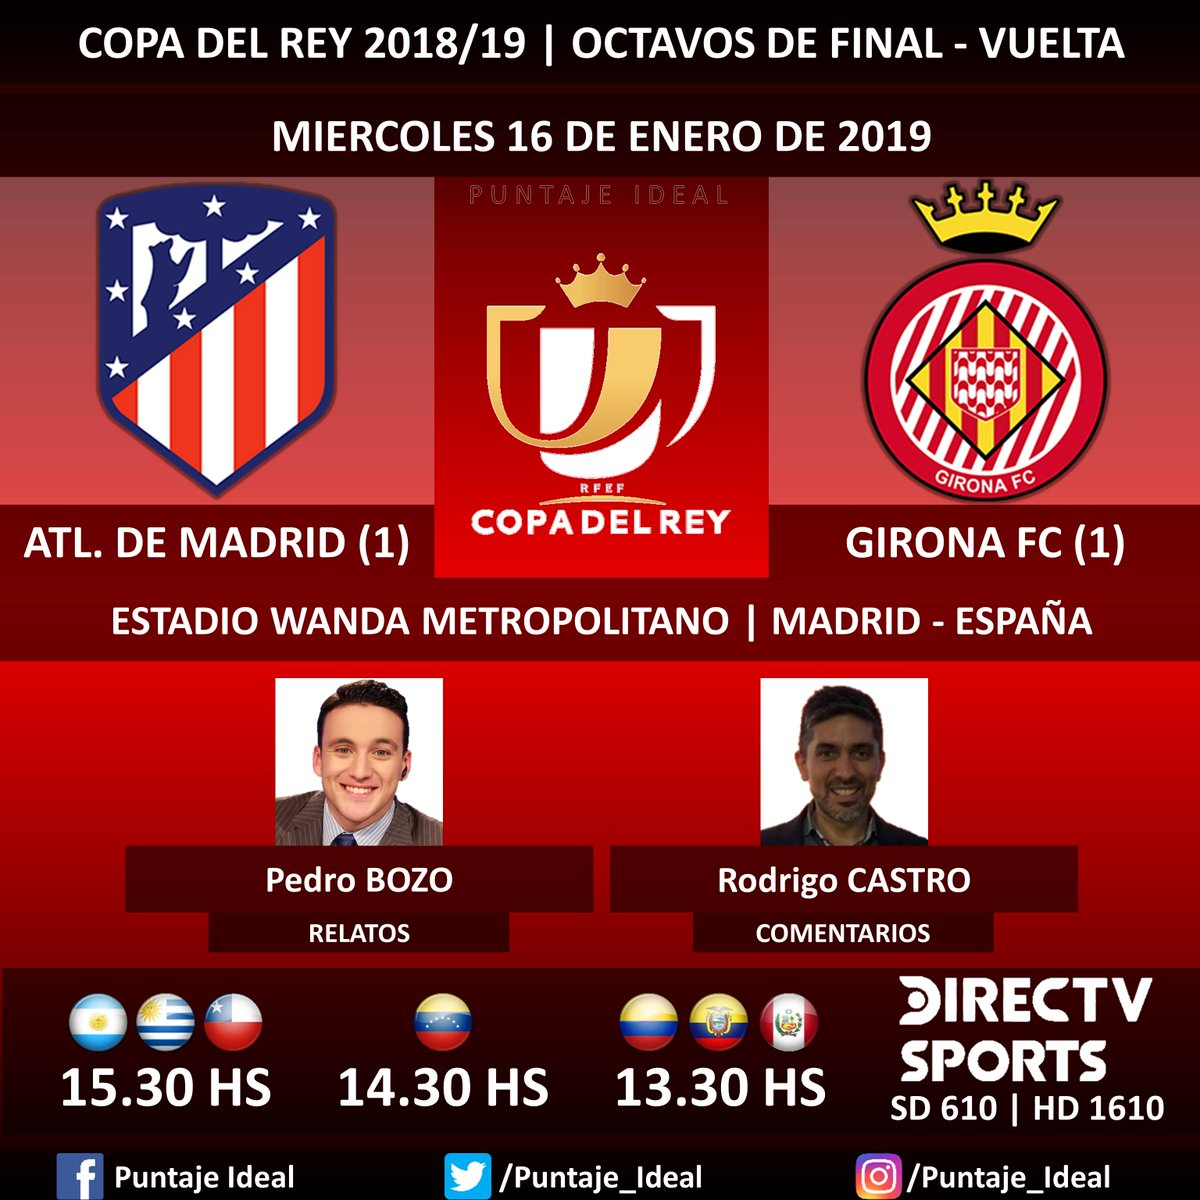 ⚽ #FútbolEnDIRECTV   #AtléticoDeMadrid vs. #GironaFC 🎙 Relatos: @pedrobozoa  🎙 Comentarios: @rodrigojcastro  📺 TV: @DIRECTVSports Sudamérica (610 - 1610 HD) - #Torneos 🤳 #SoySportista - #CopaDelRey 🇪🇸 - #AtletiGirona  Dale RT 🔃